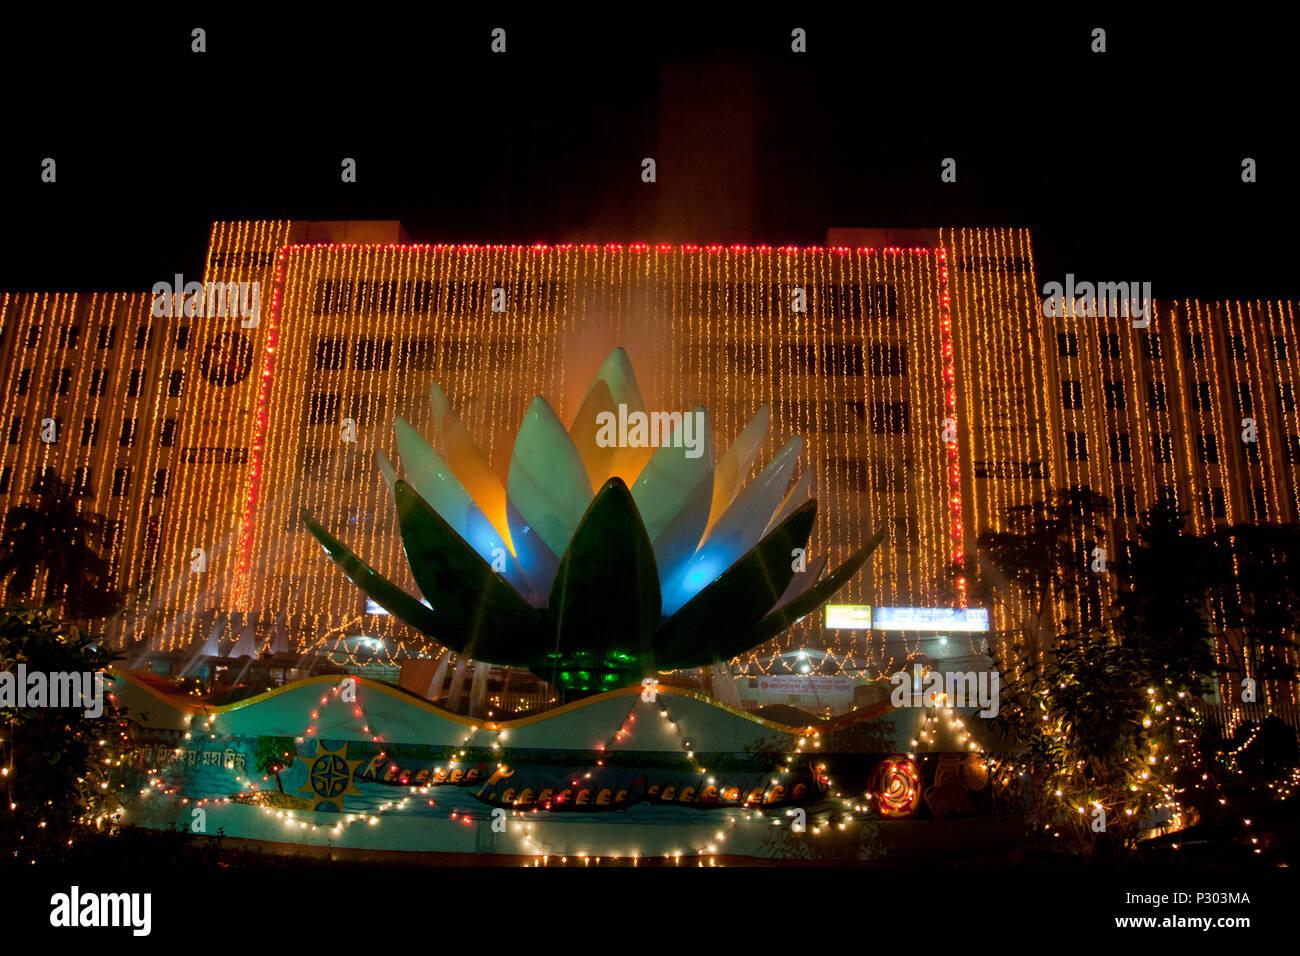 Sonali Bank Building is decorated on the eve of the Bijoy Dibash, or Victory Day of Bangladesh. Dhaka, Bangladesh. - Stock Image